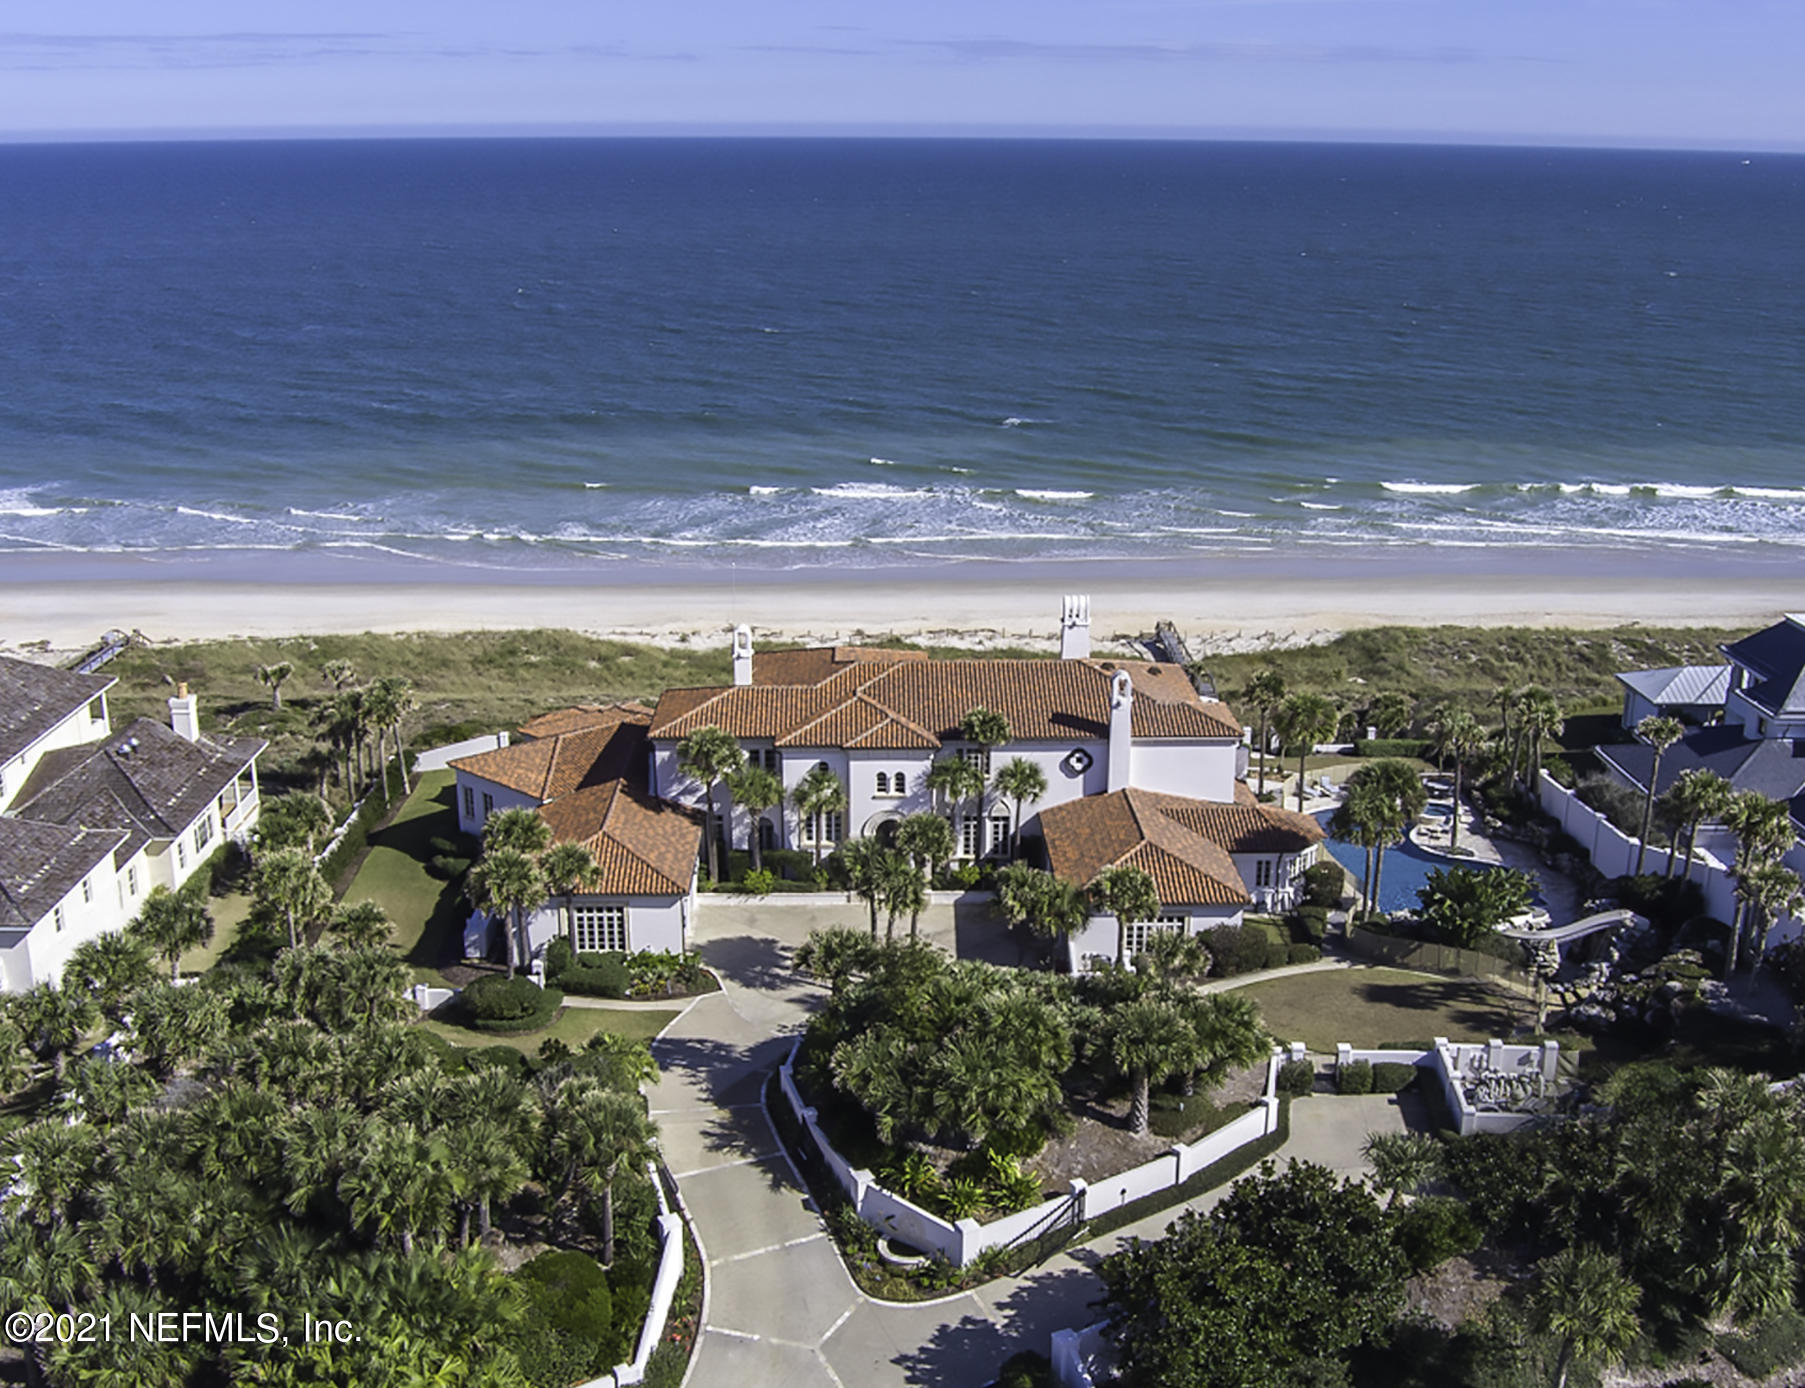 1205 PONTE VEDRA, PONTE VEDRA BEACH, FLORIDA 32082, 6 Bedrooms Bedrooms, ,9 BathroomsBathrooms,Residential,For sale,PONTE VEDRA,1091375